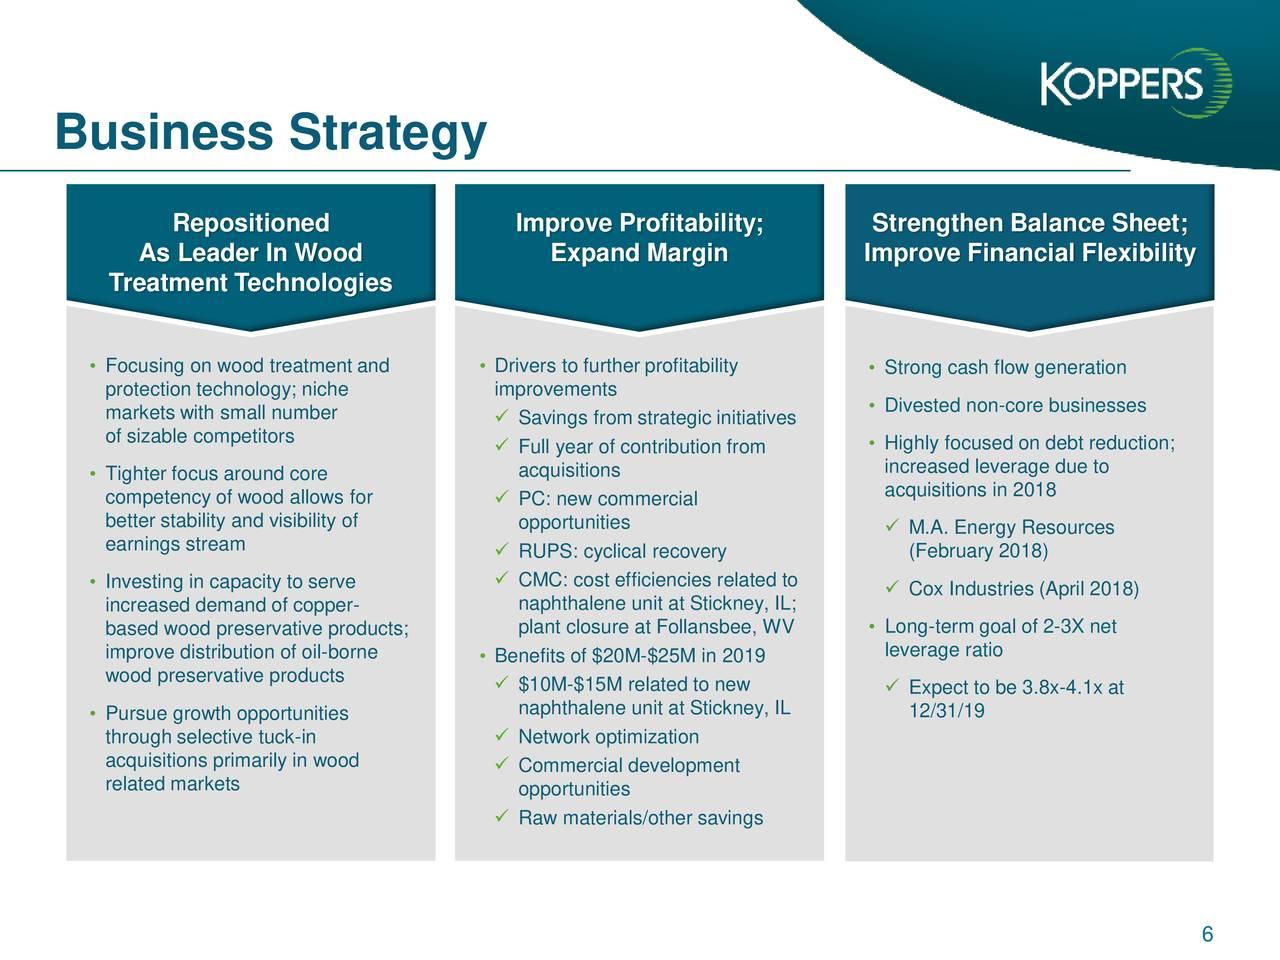 Kopp investment advisors performance management financial planning investment groups